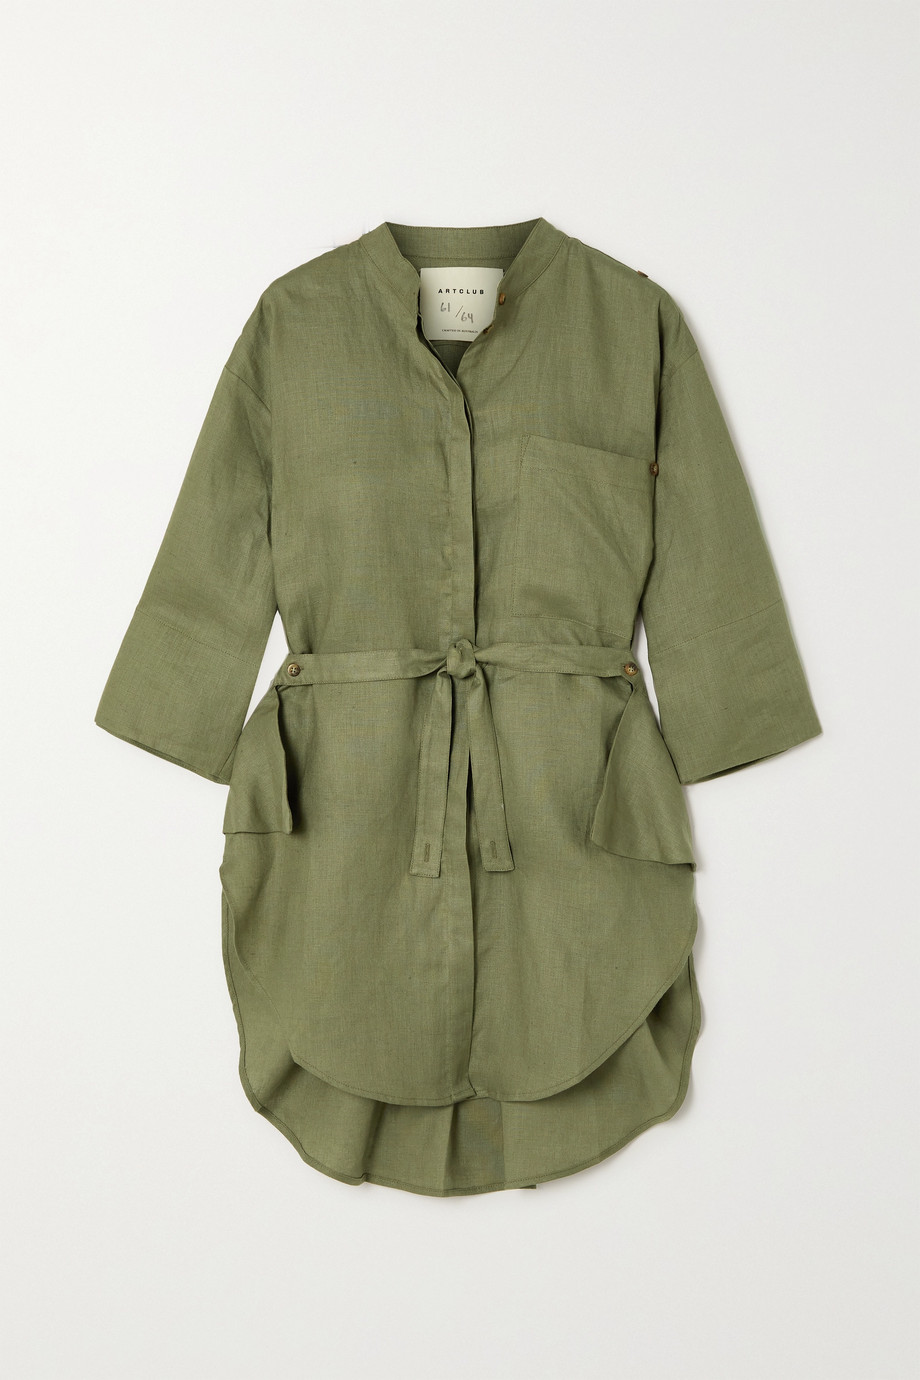 ARTCLUB + NET SUSTAIN Florican belted linen shirt